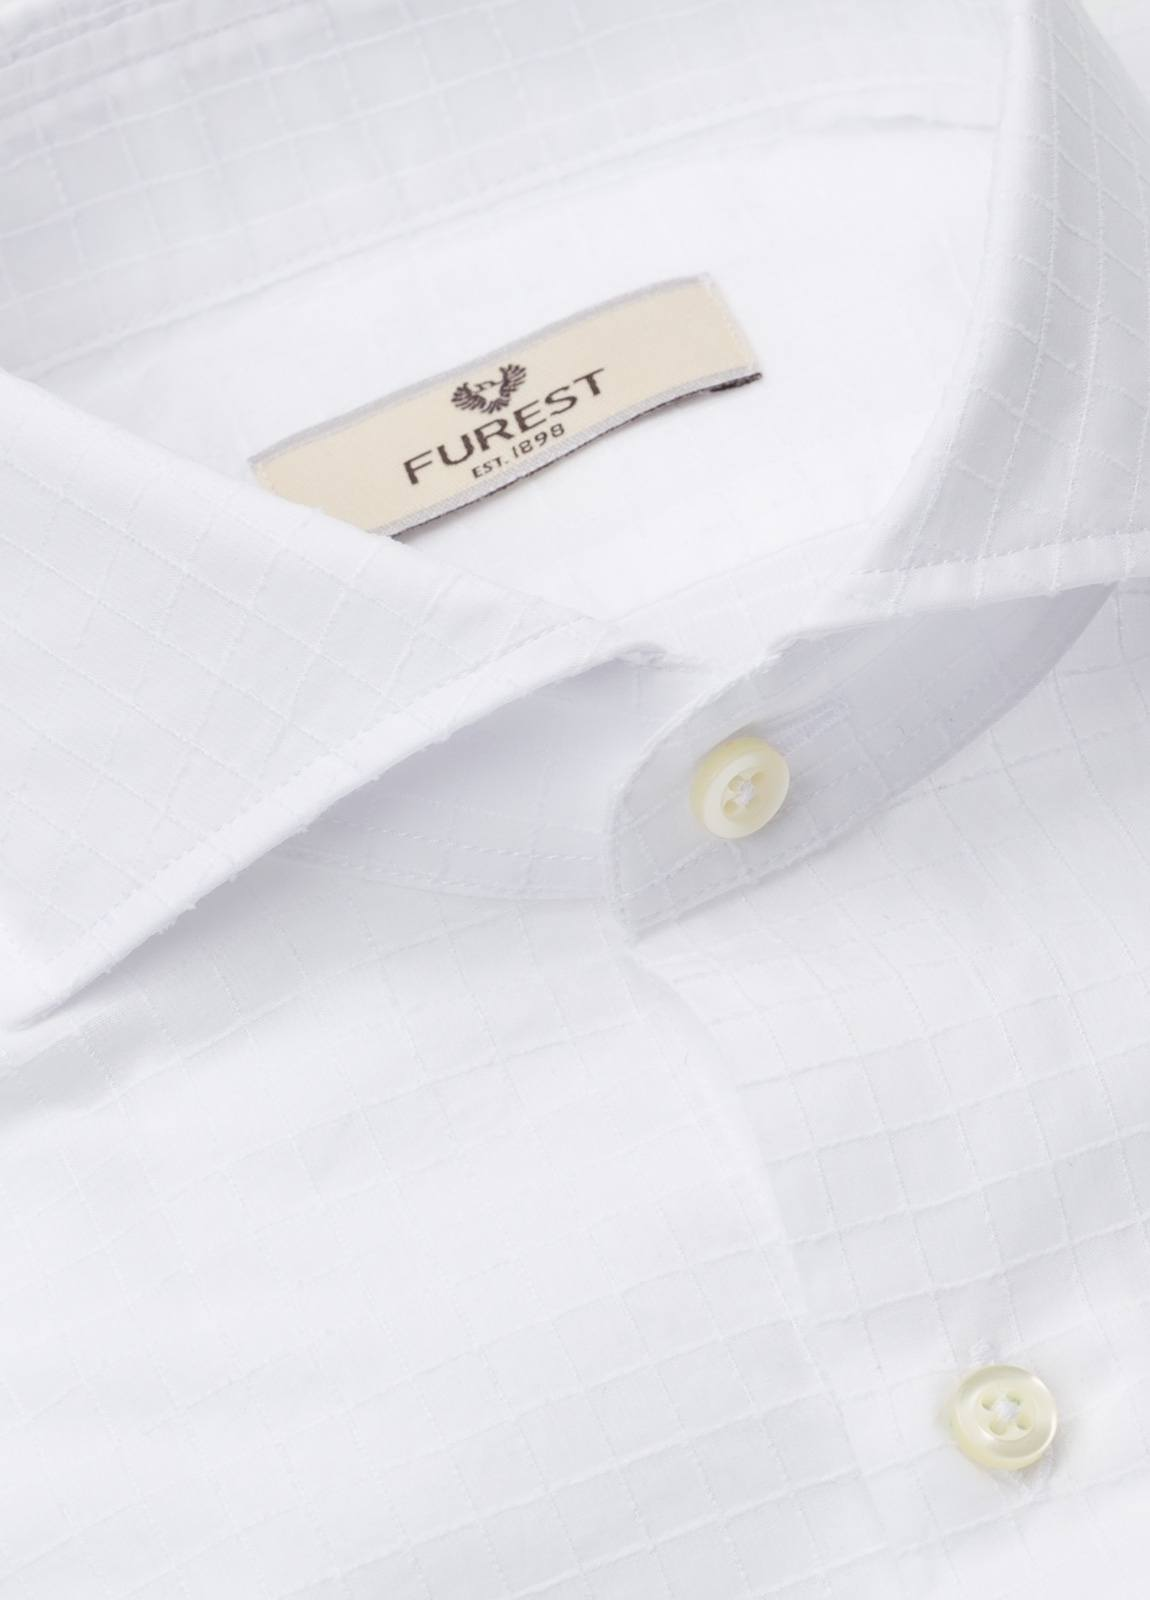 Camisa Leisure Wear SLIM FIT Modelo CAPRI tejido cuadro ventana color blanco, 100% Algodón. - Ítem3